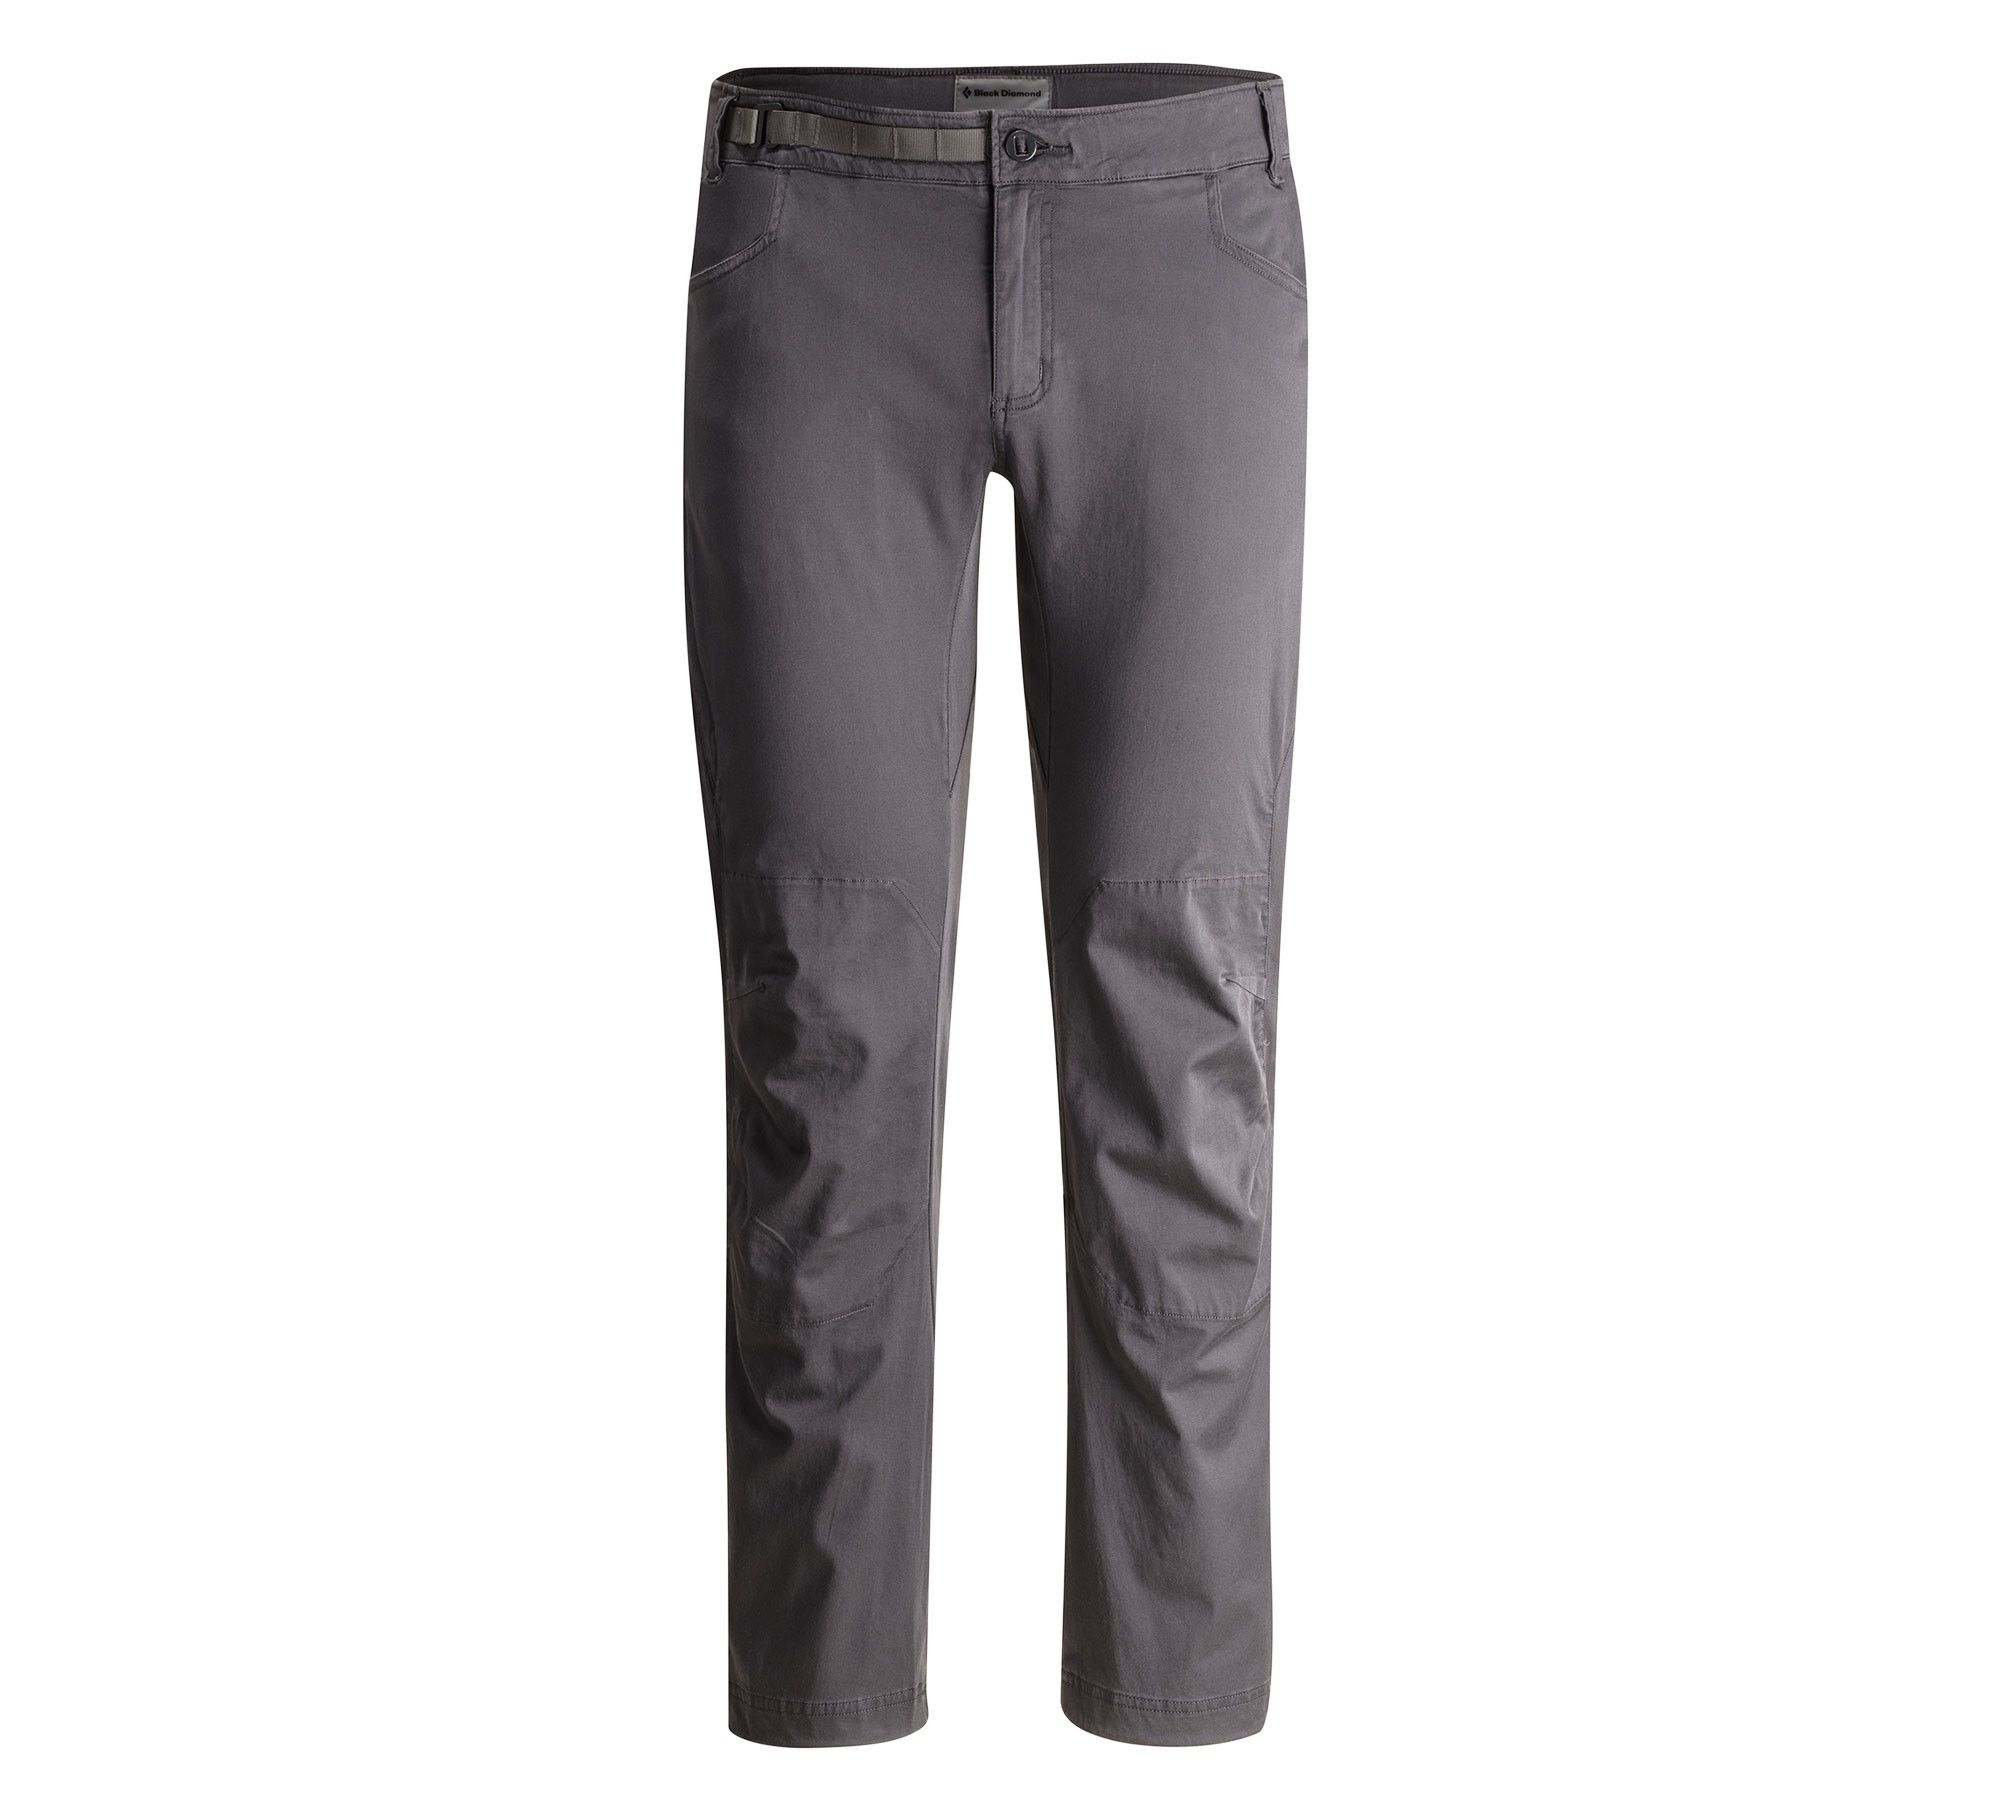 Black Diamond M Credo Pants | Größe 28,30,32,38,34,36 | Herren Hose